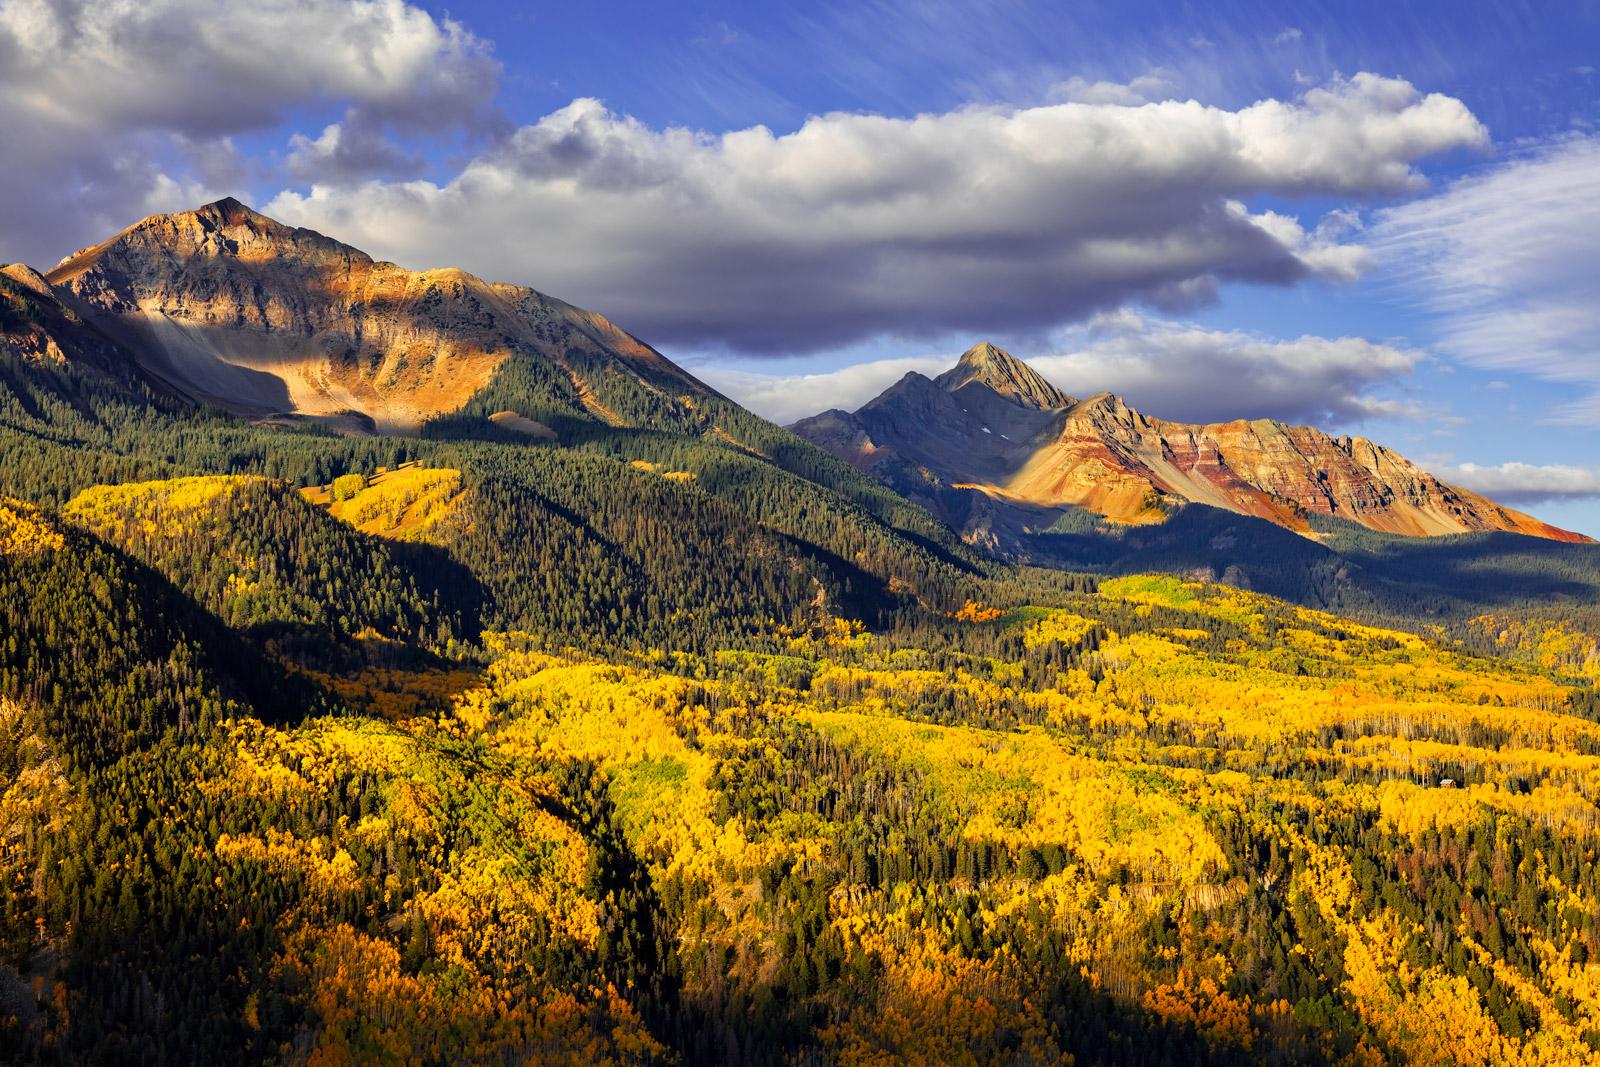 Colorado, Wilson Peak, Fall, Color, limited edition, photograph, southwest colorado, fine art, landscape, fall color, photo